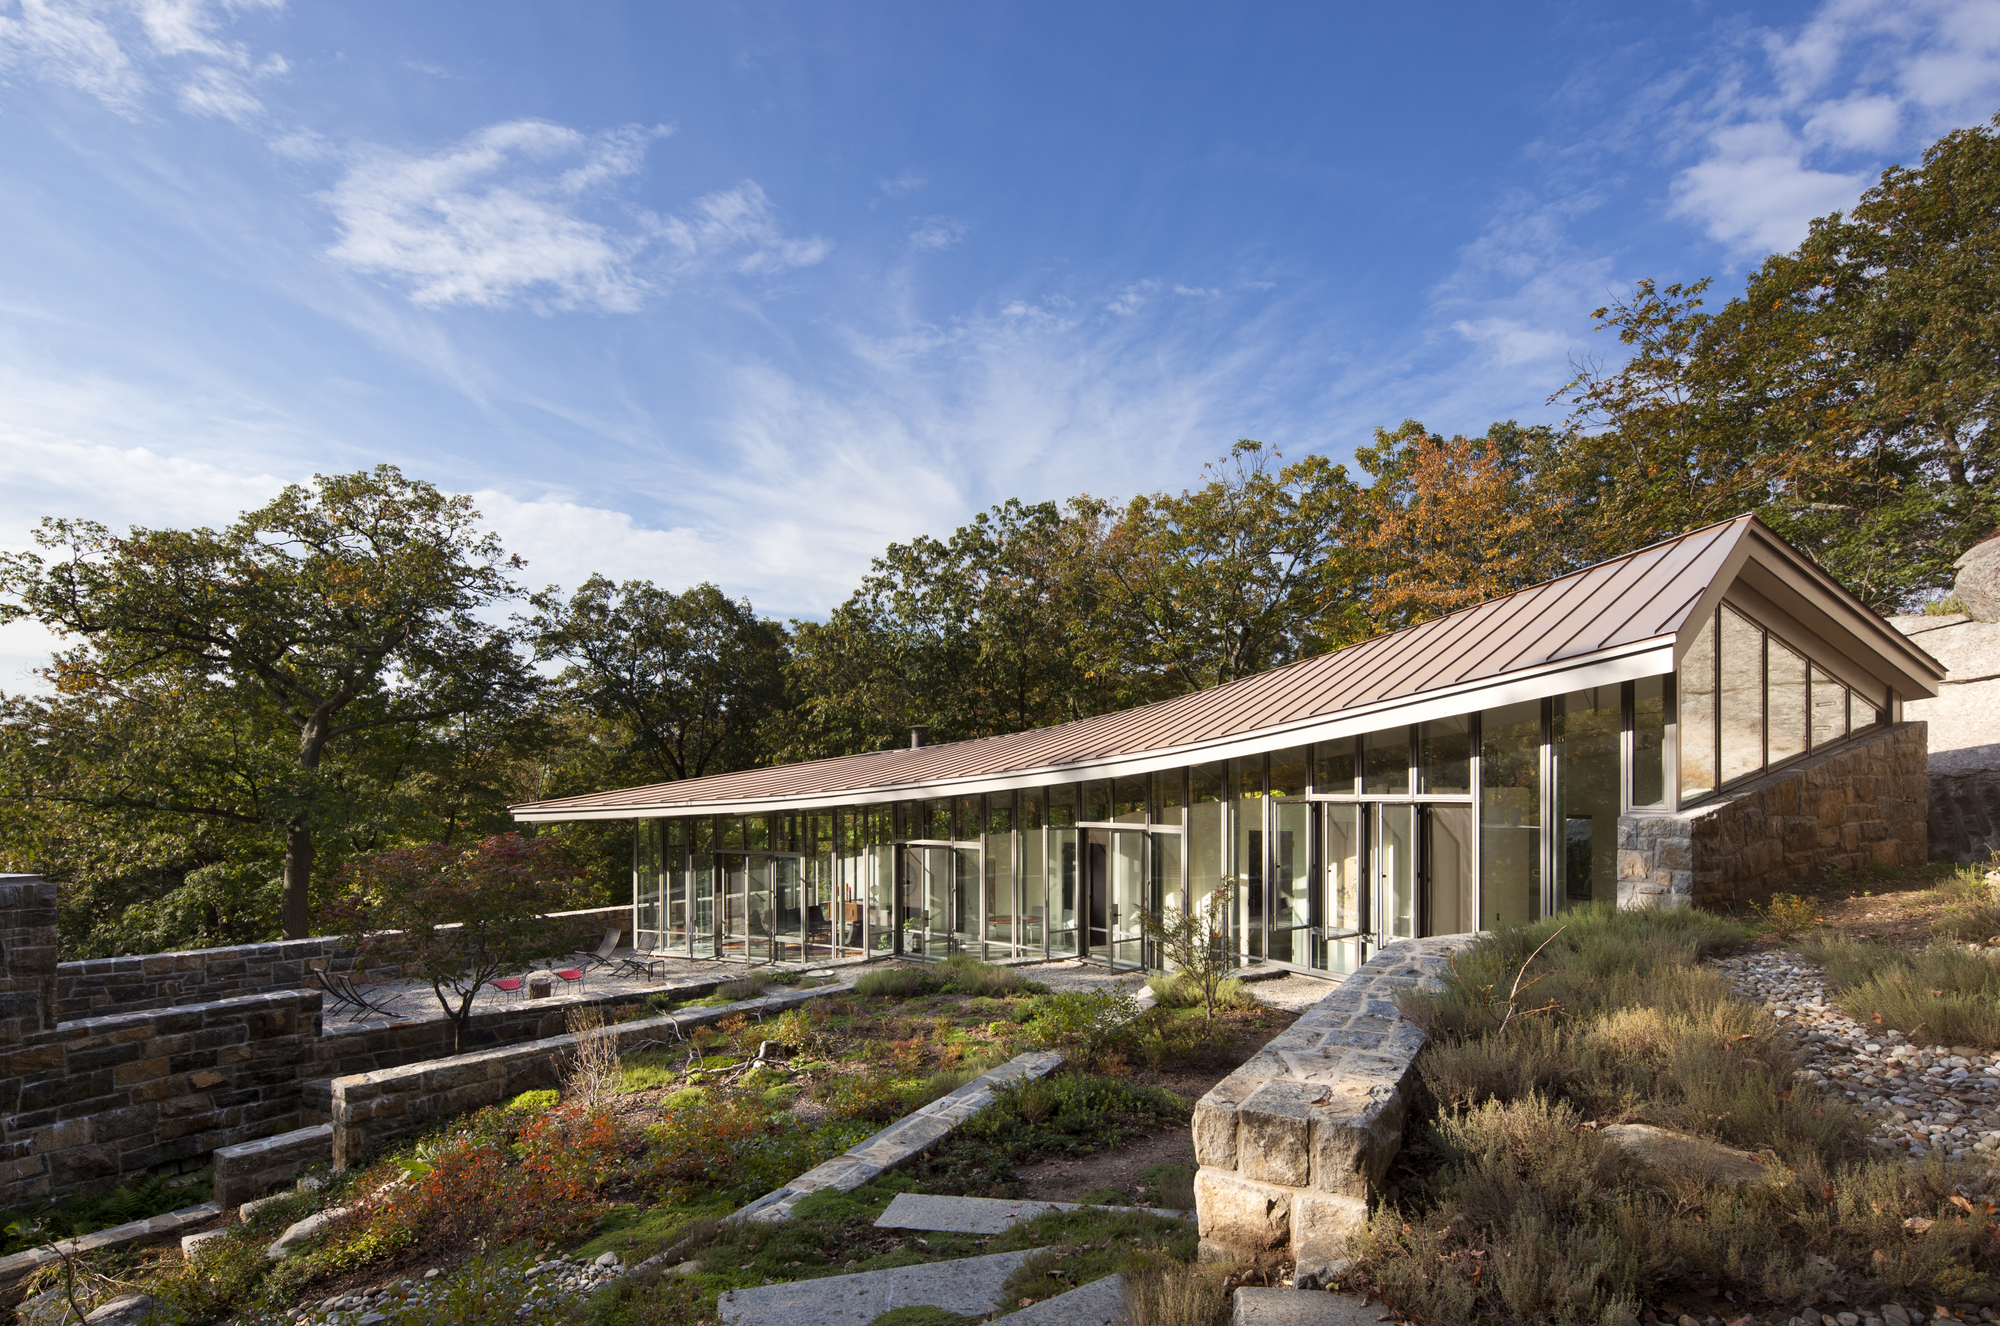 McCann Residence / Weiss/Manfredi   ArchDaily